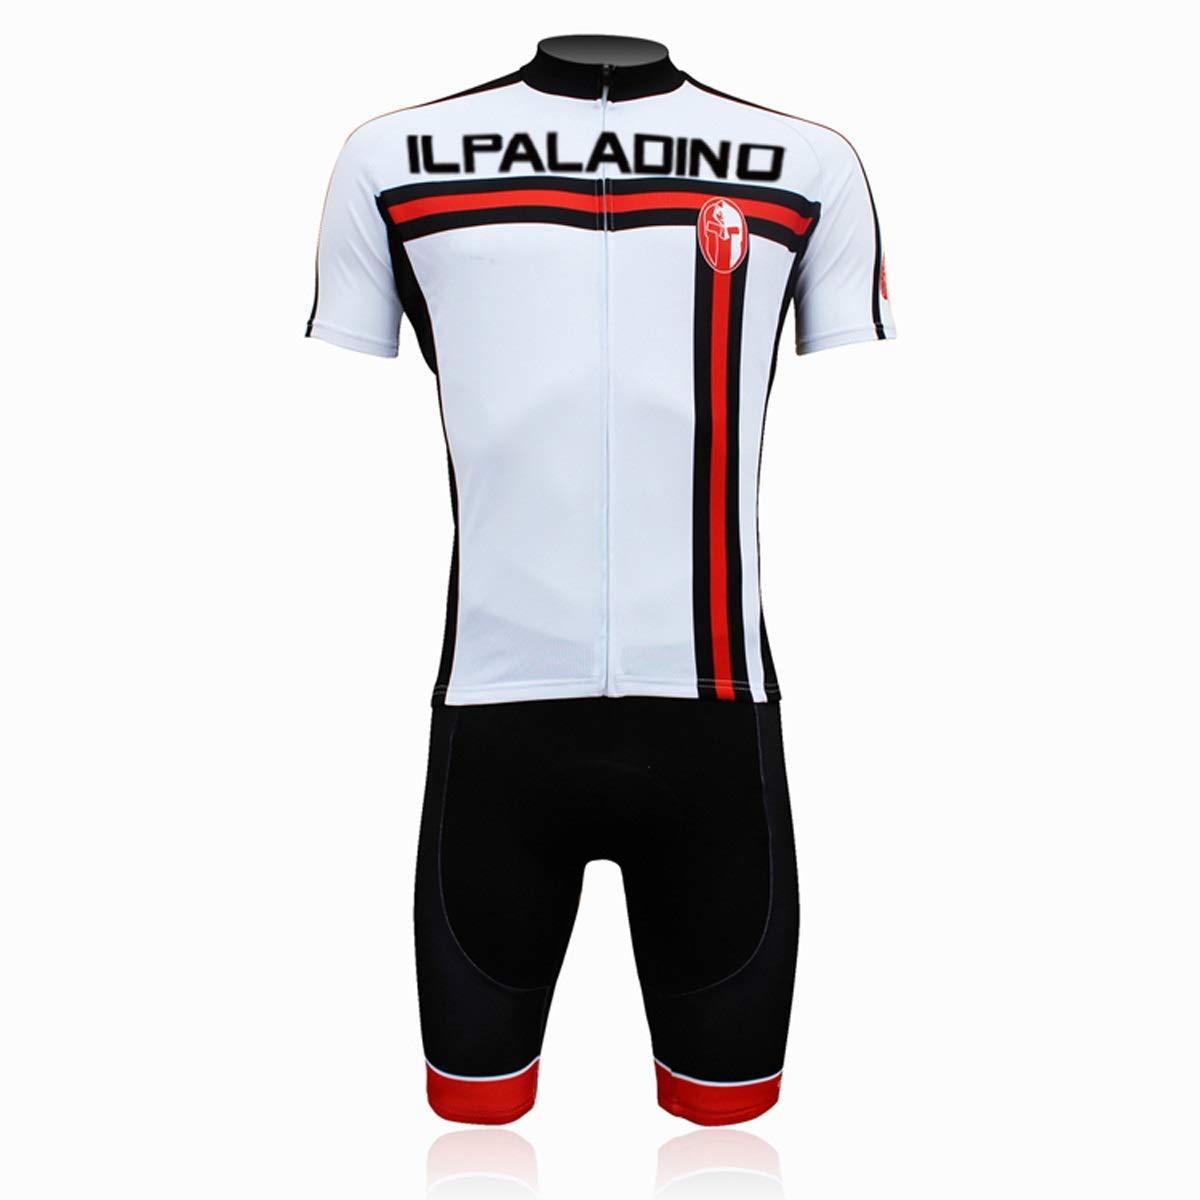 Fahrrad Reitanzug Jersey Herren Sommer Langarm Shirt Frühling und Herbst Atmungsaktives Gewebe Fahrradtrikot LPLHJD